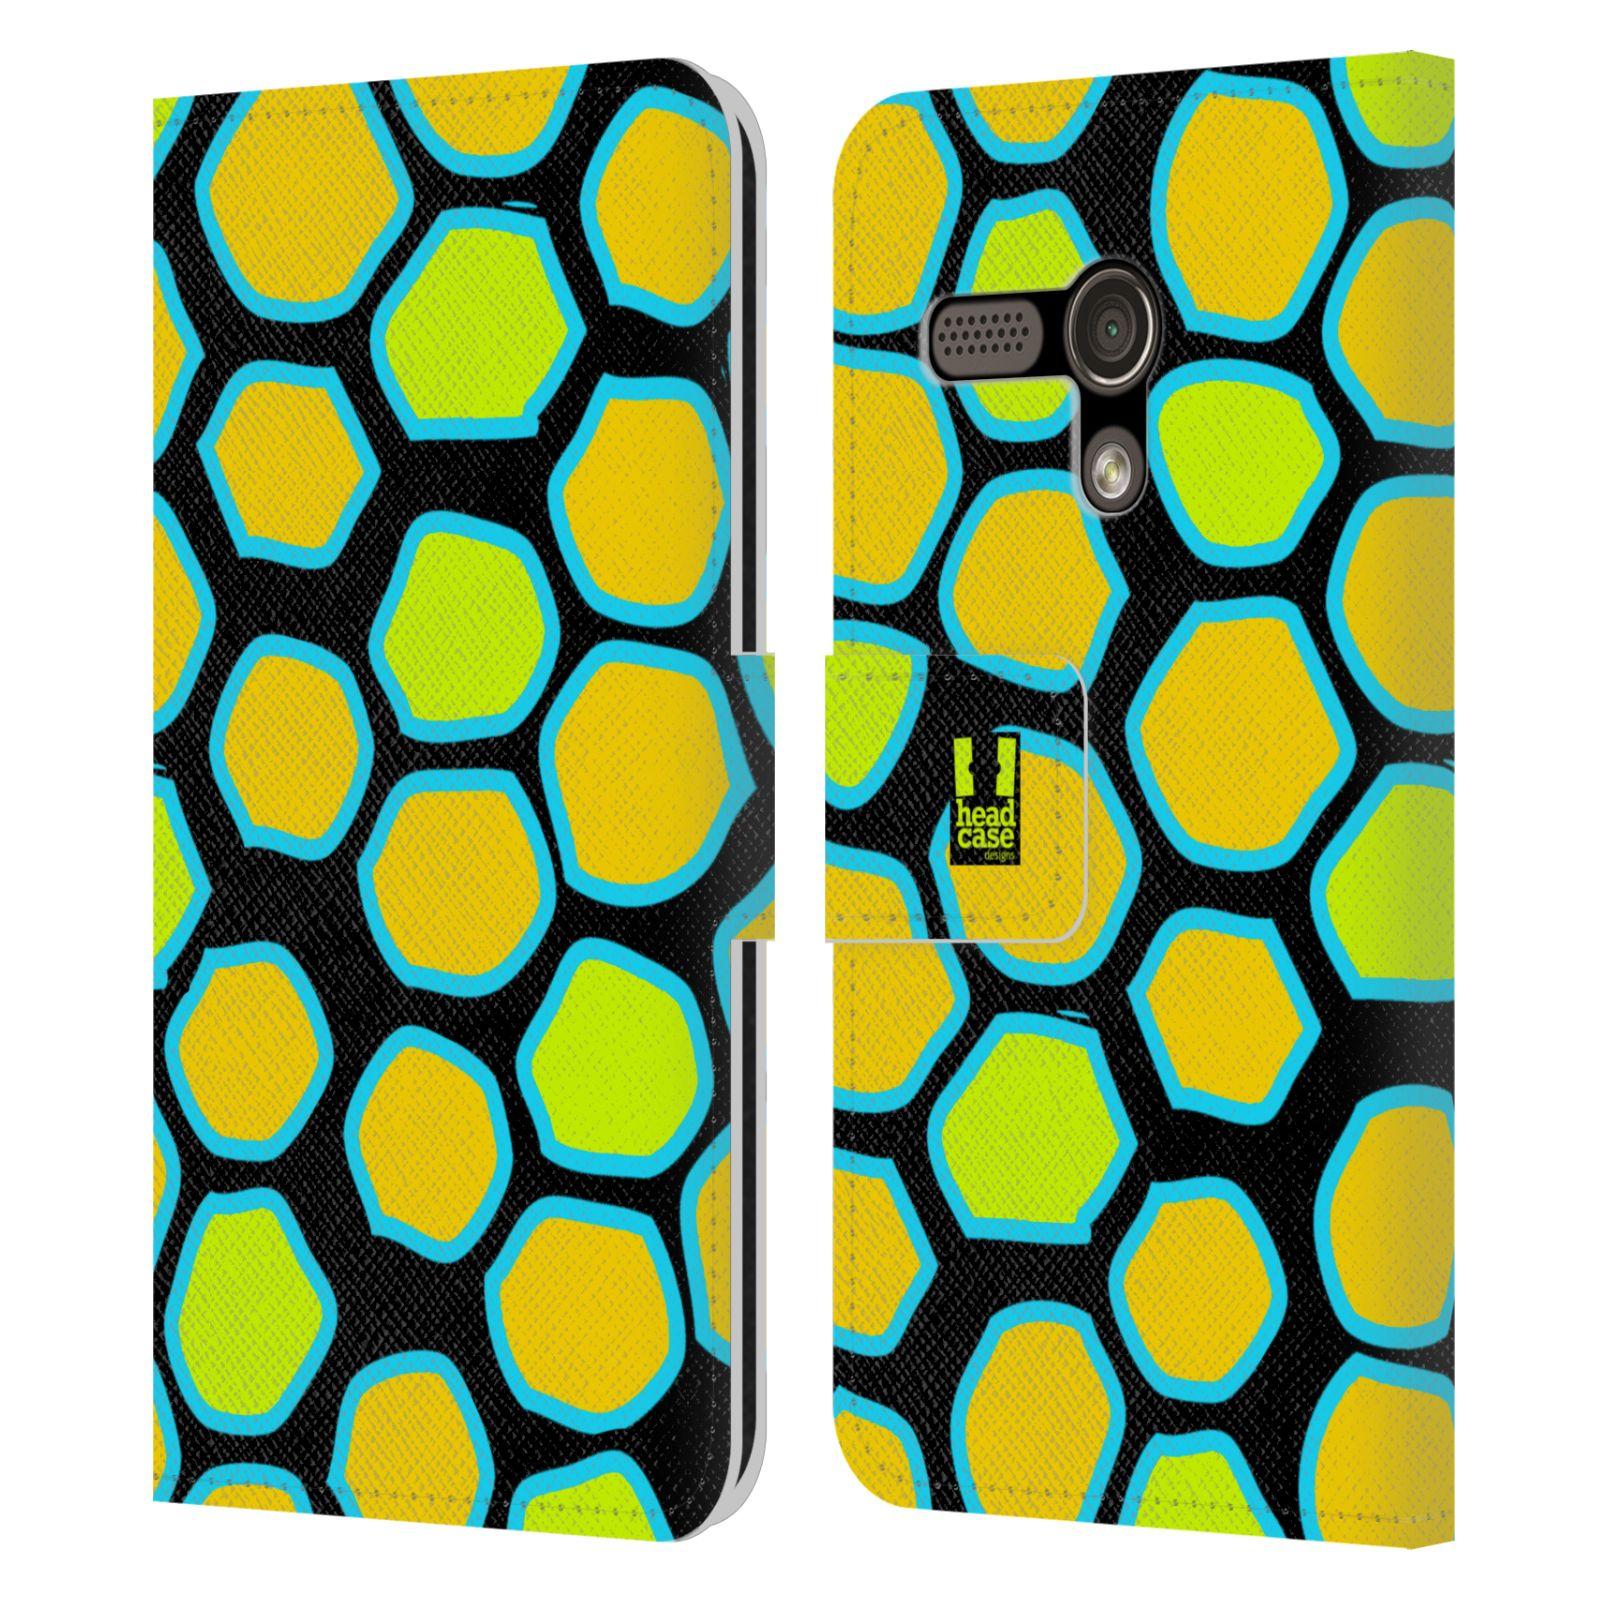 HEAD CASE Flipové pouzdro pro mobil MOTOROLA MOTO G Zvířecí barevné vzory žlutý had